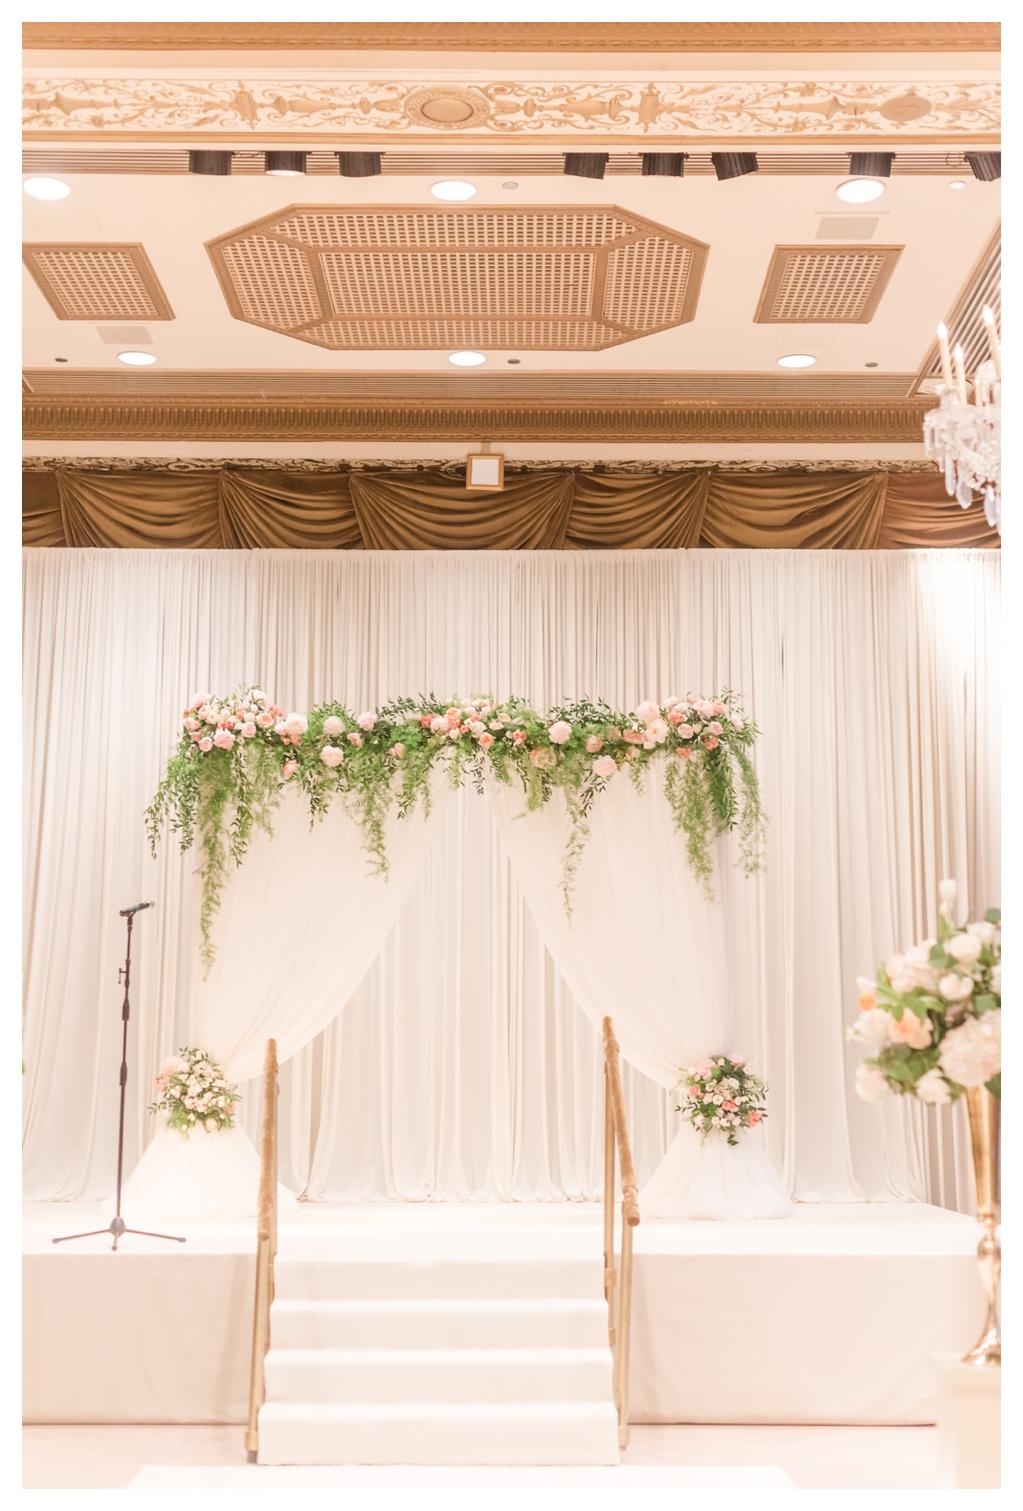 Drake Hotel Gold Coast Room Wedding_0358.jpg